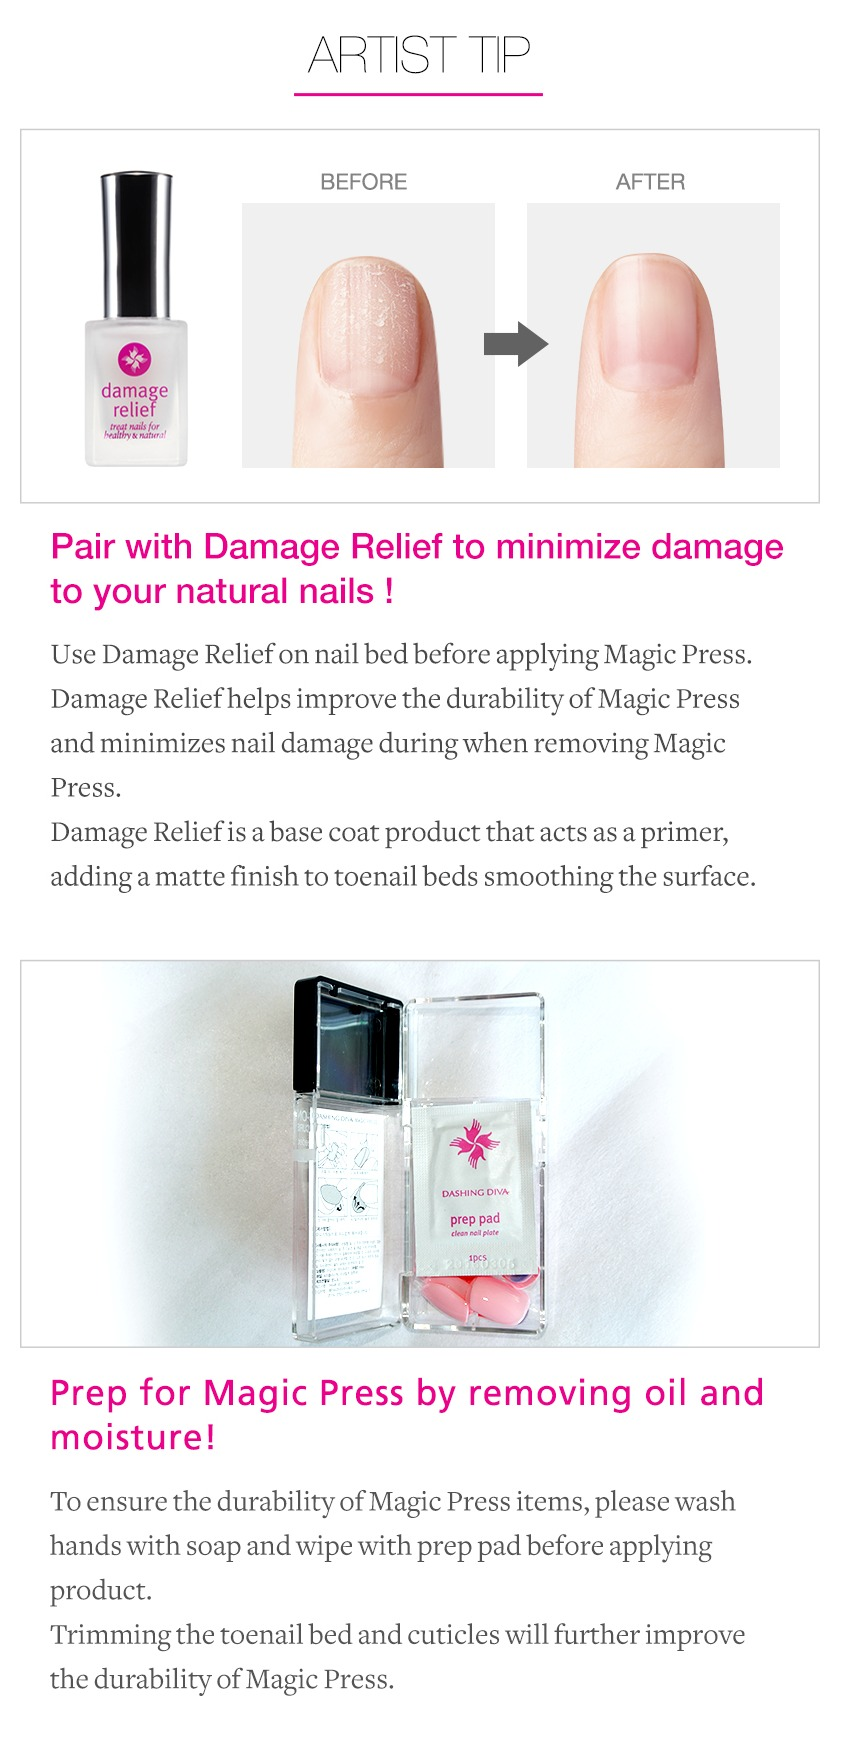 DASHING DIVA] Magic Press / Disposable Nail Tip | eBay